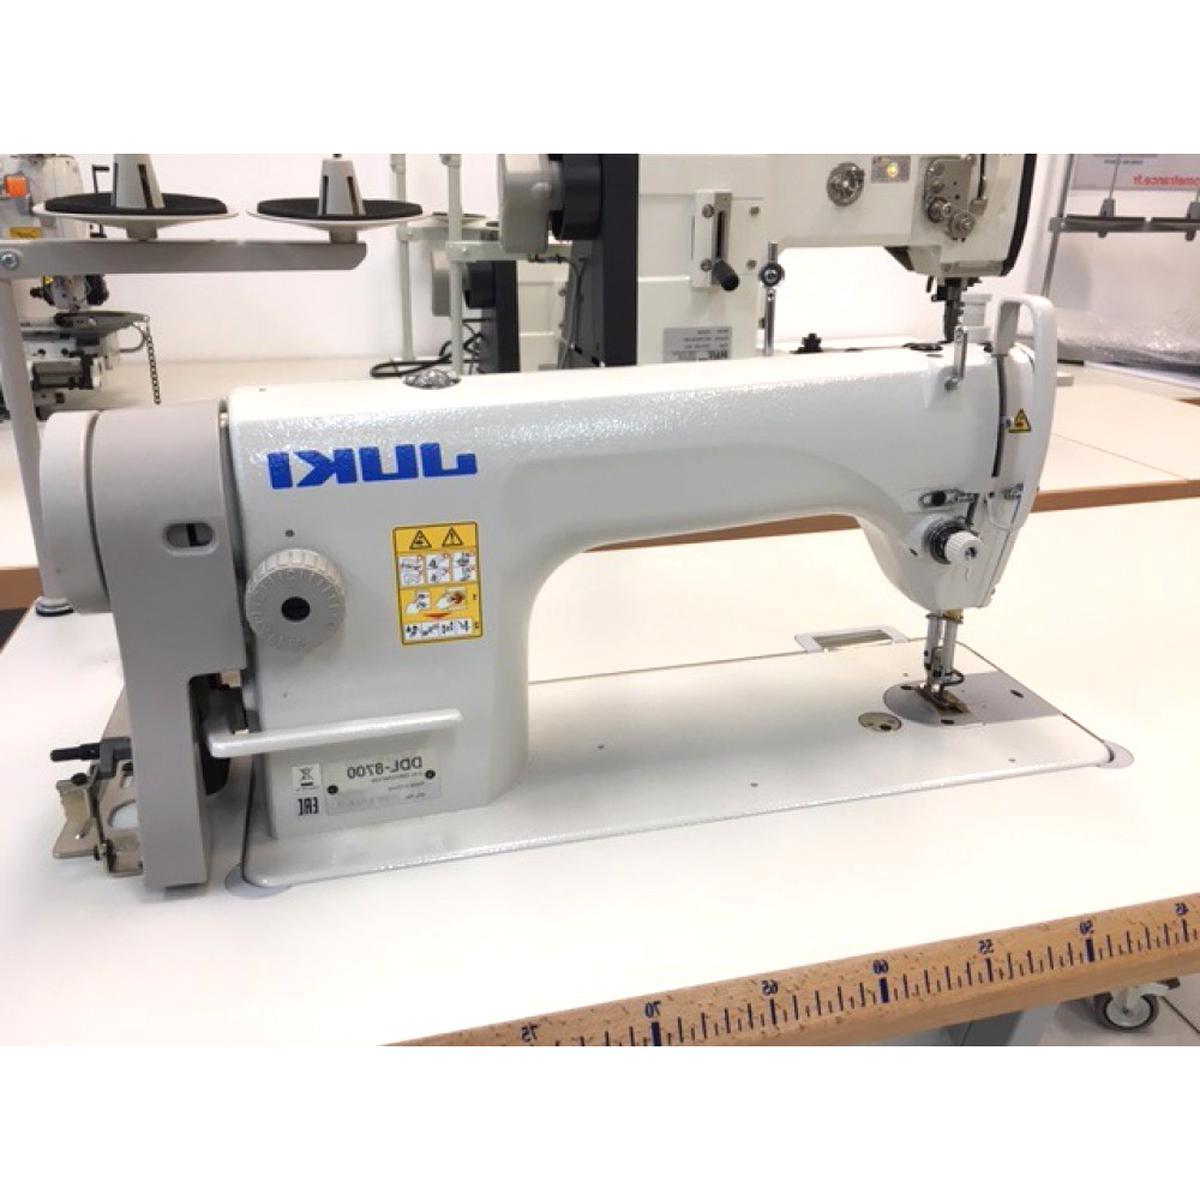 machine coudre industrielle juki pfaff d'occasion